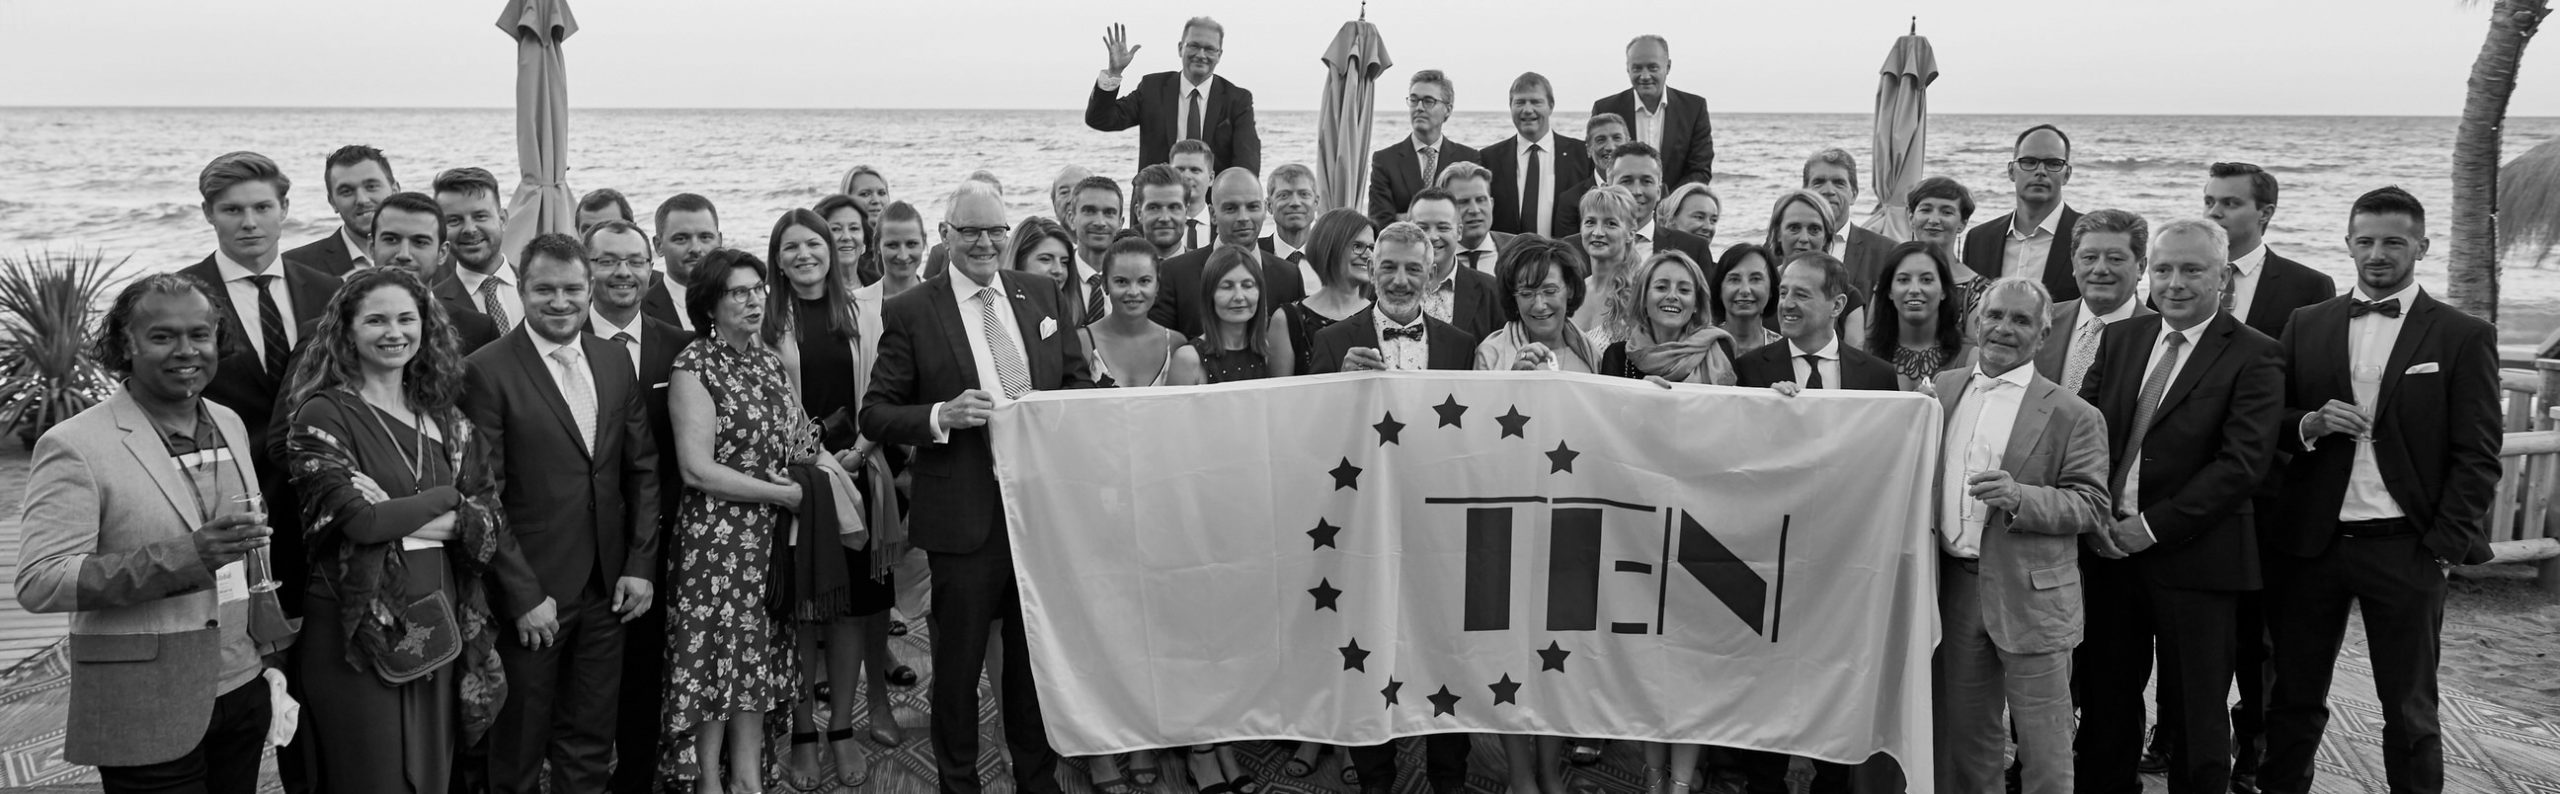 Grilc, Starc & Partnerji Mednaroden Povezave TEN (The European Network)_